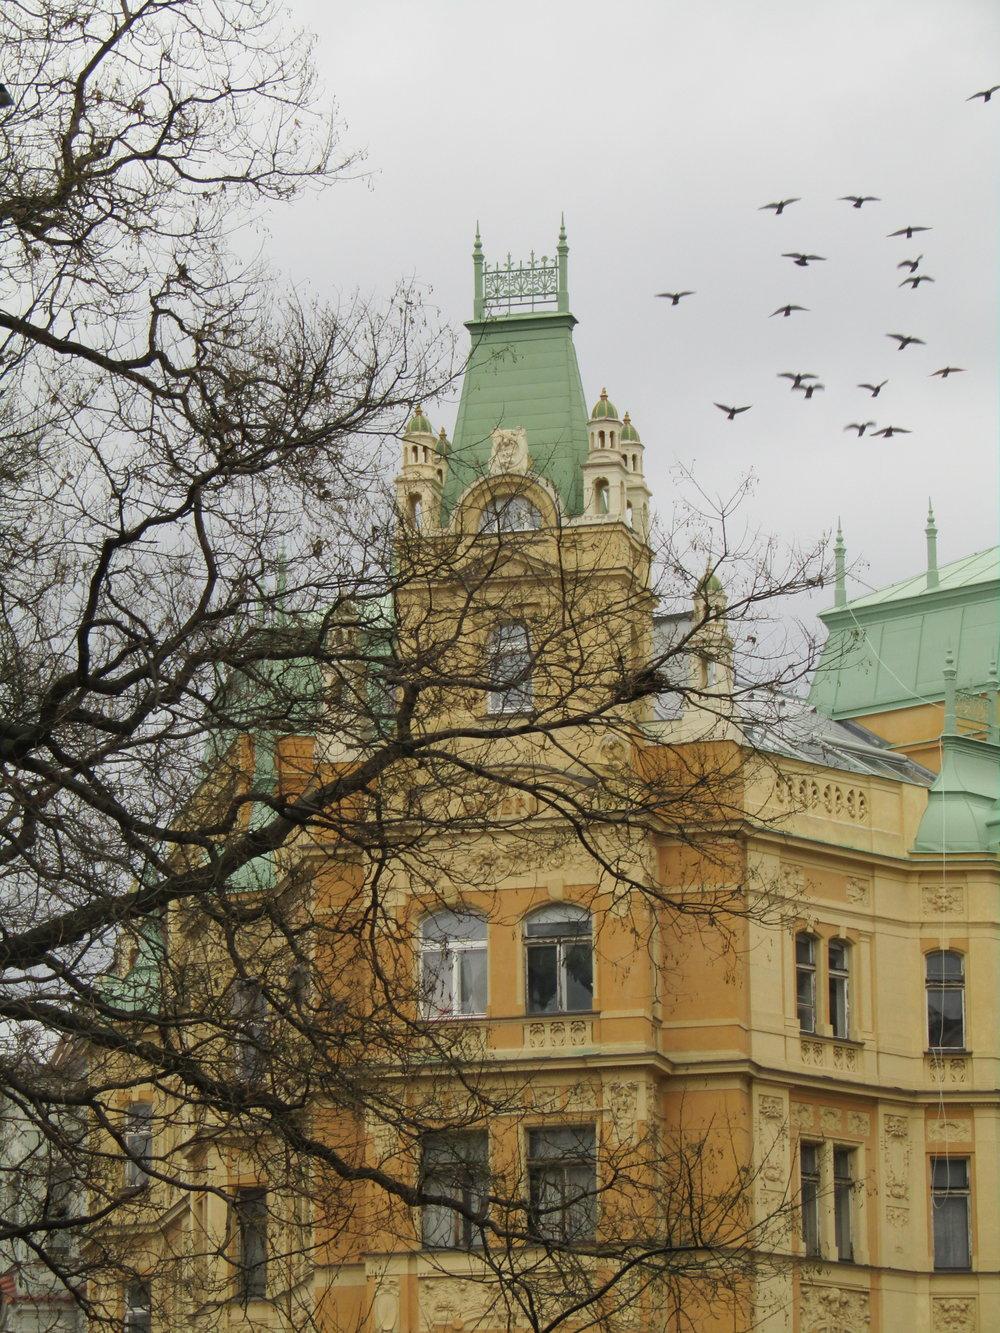 Praga-Stefano-Zulian 10.jpg